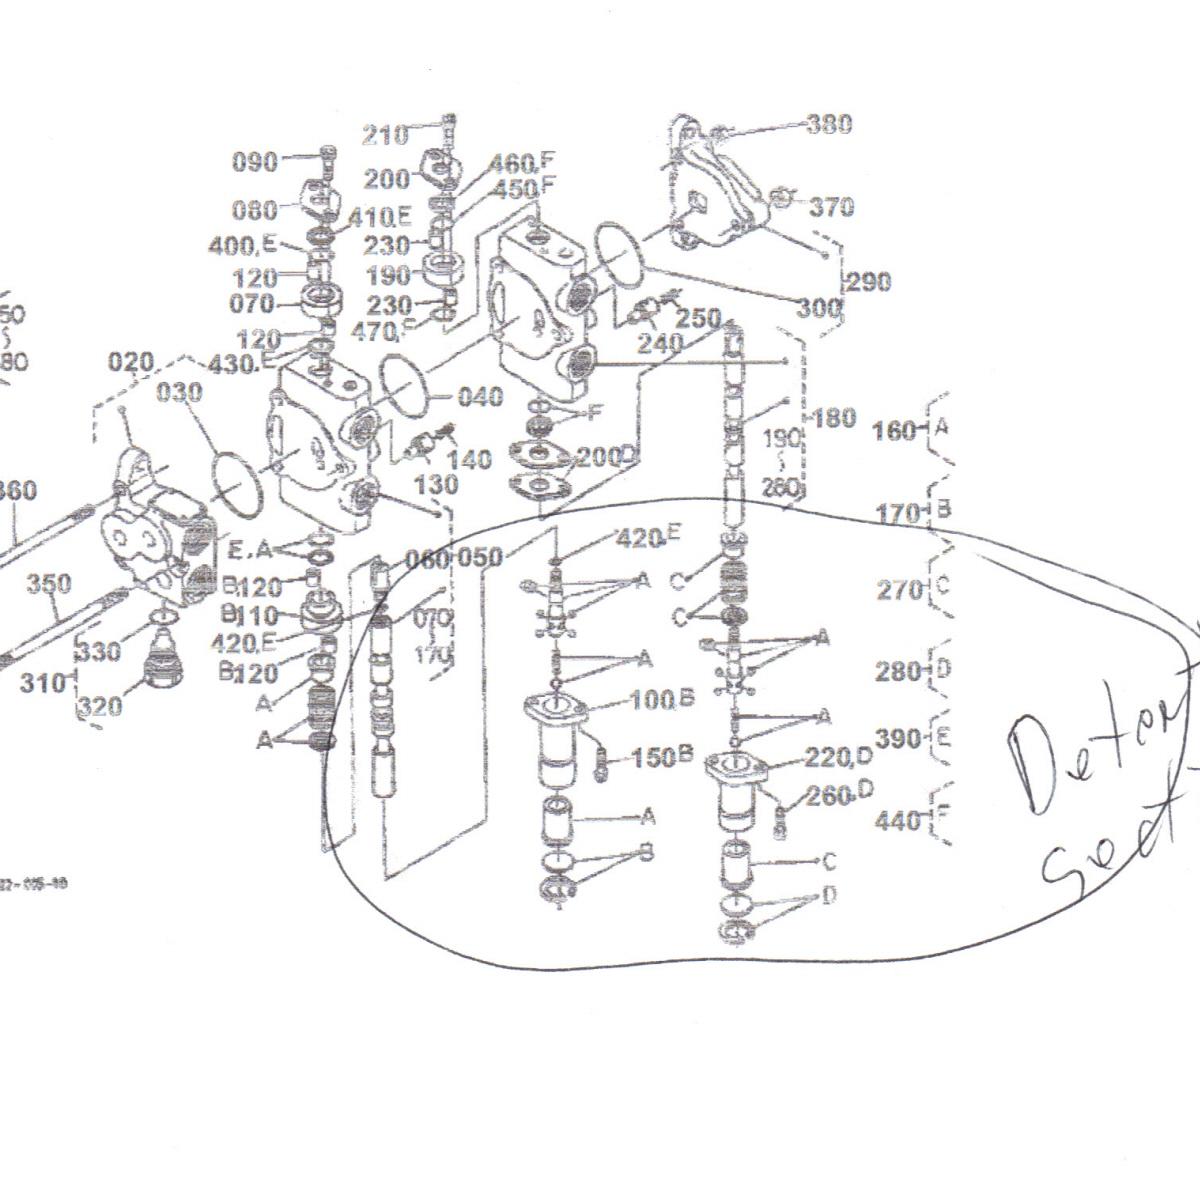 Kubota Tractor Engines in addition Kubota G1800 Parts Diagram further Kubota Front Axle Diagram furthermore Wiring Diagram For Kubota M6800 Tractor moreover 103606 Detailed Parts Diagrams. on kubota bx25 wiring diagram diagrams